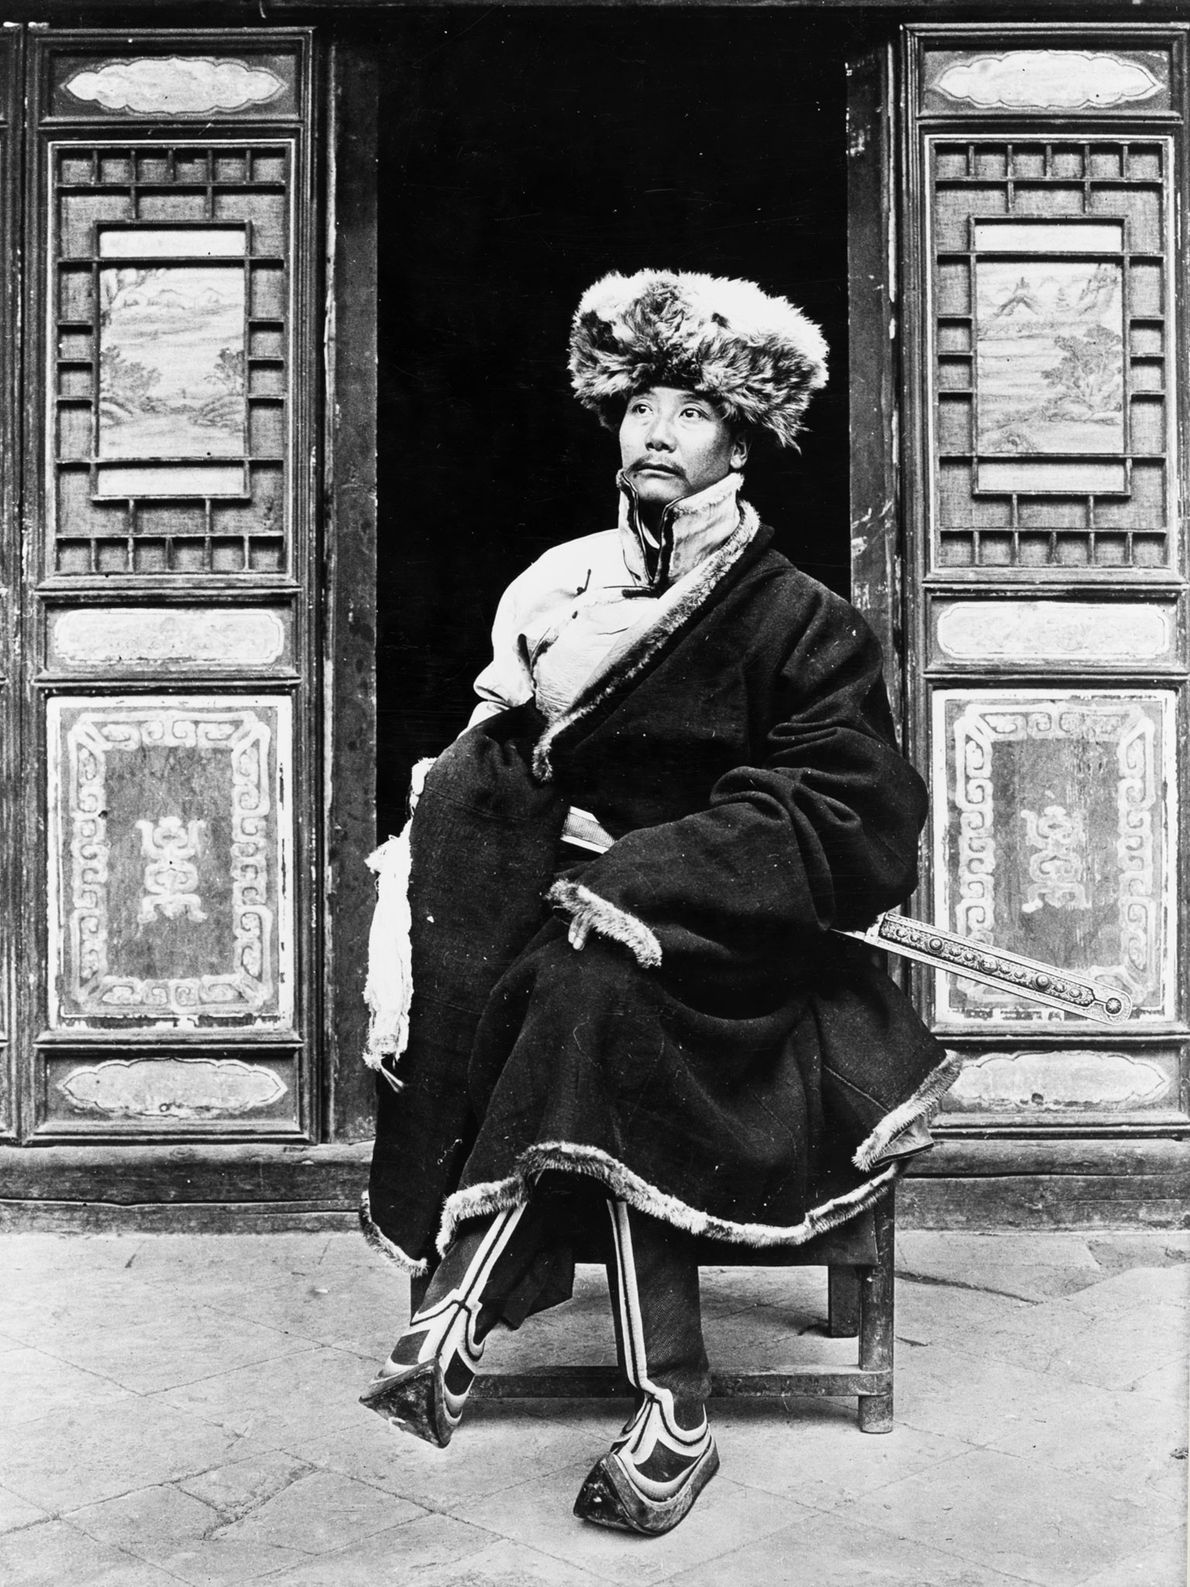 Yang-Chi-ching, prince de Liulin dans la province du Gansu en Chine, prend la pose en face ...